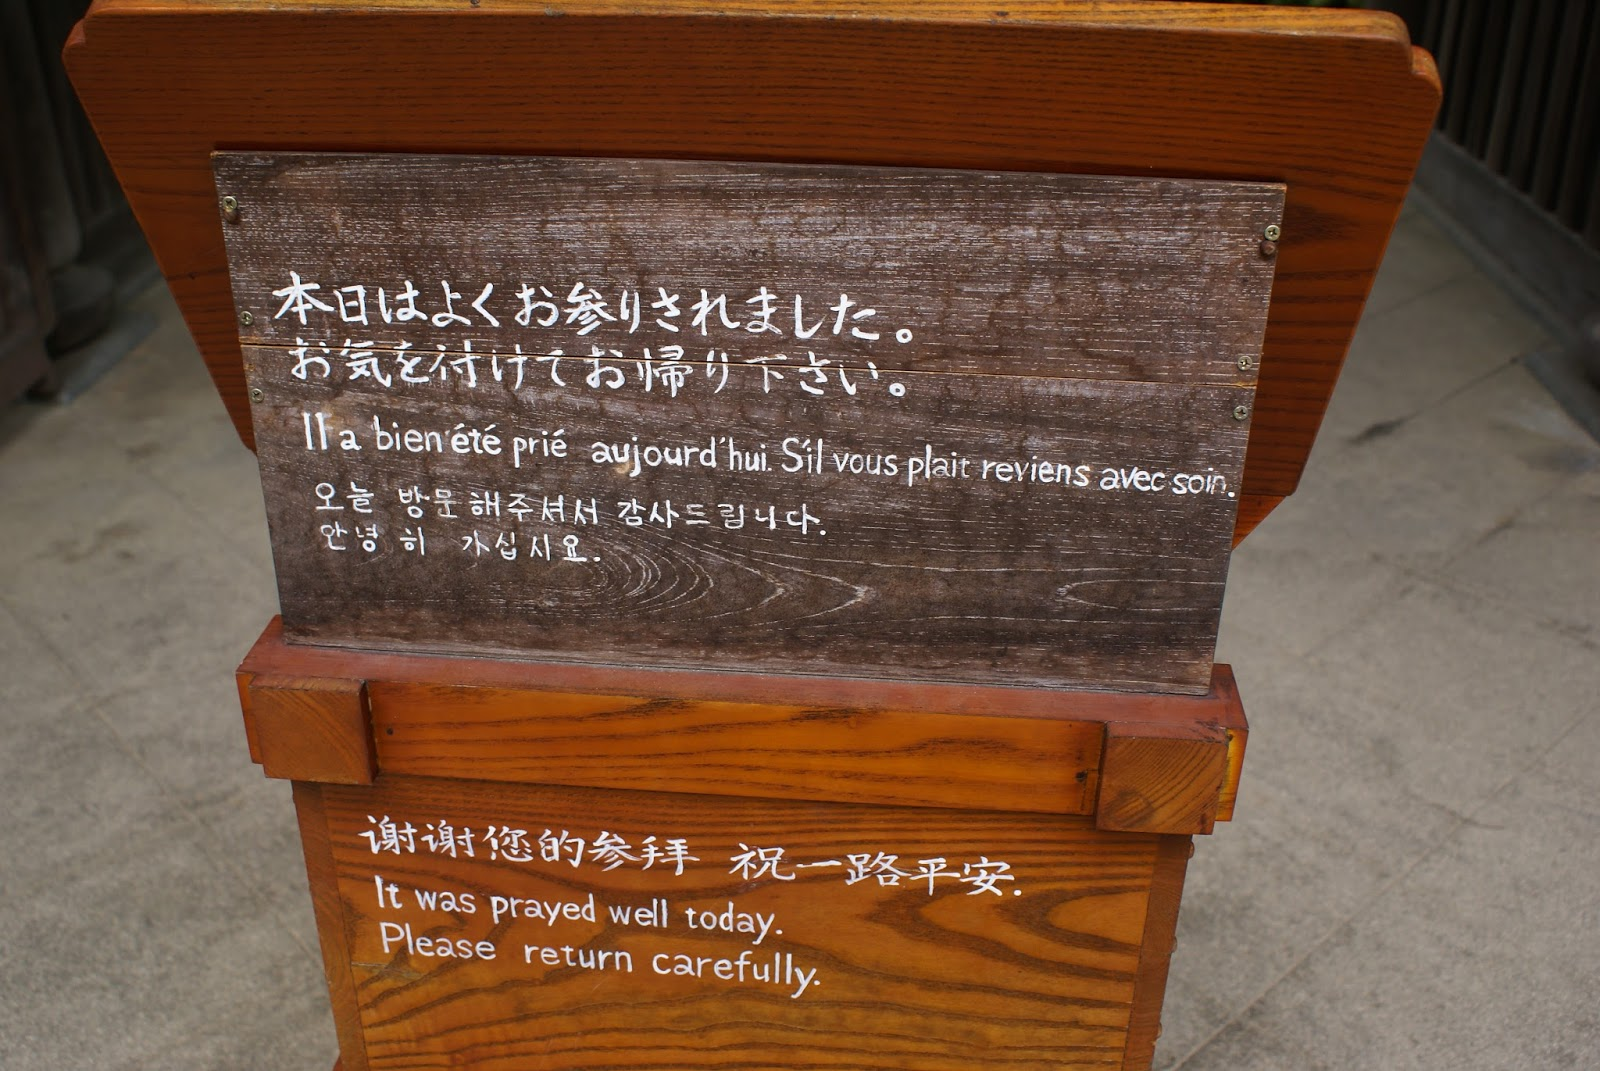 daisho-in buddhist temple japan miyajima franponais itsukushima